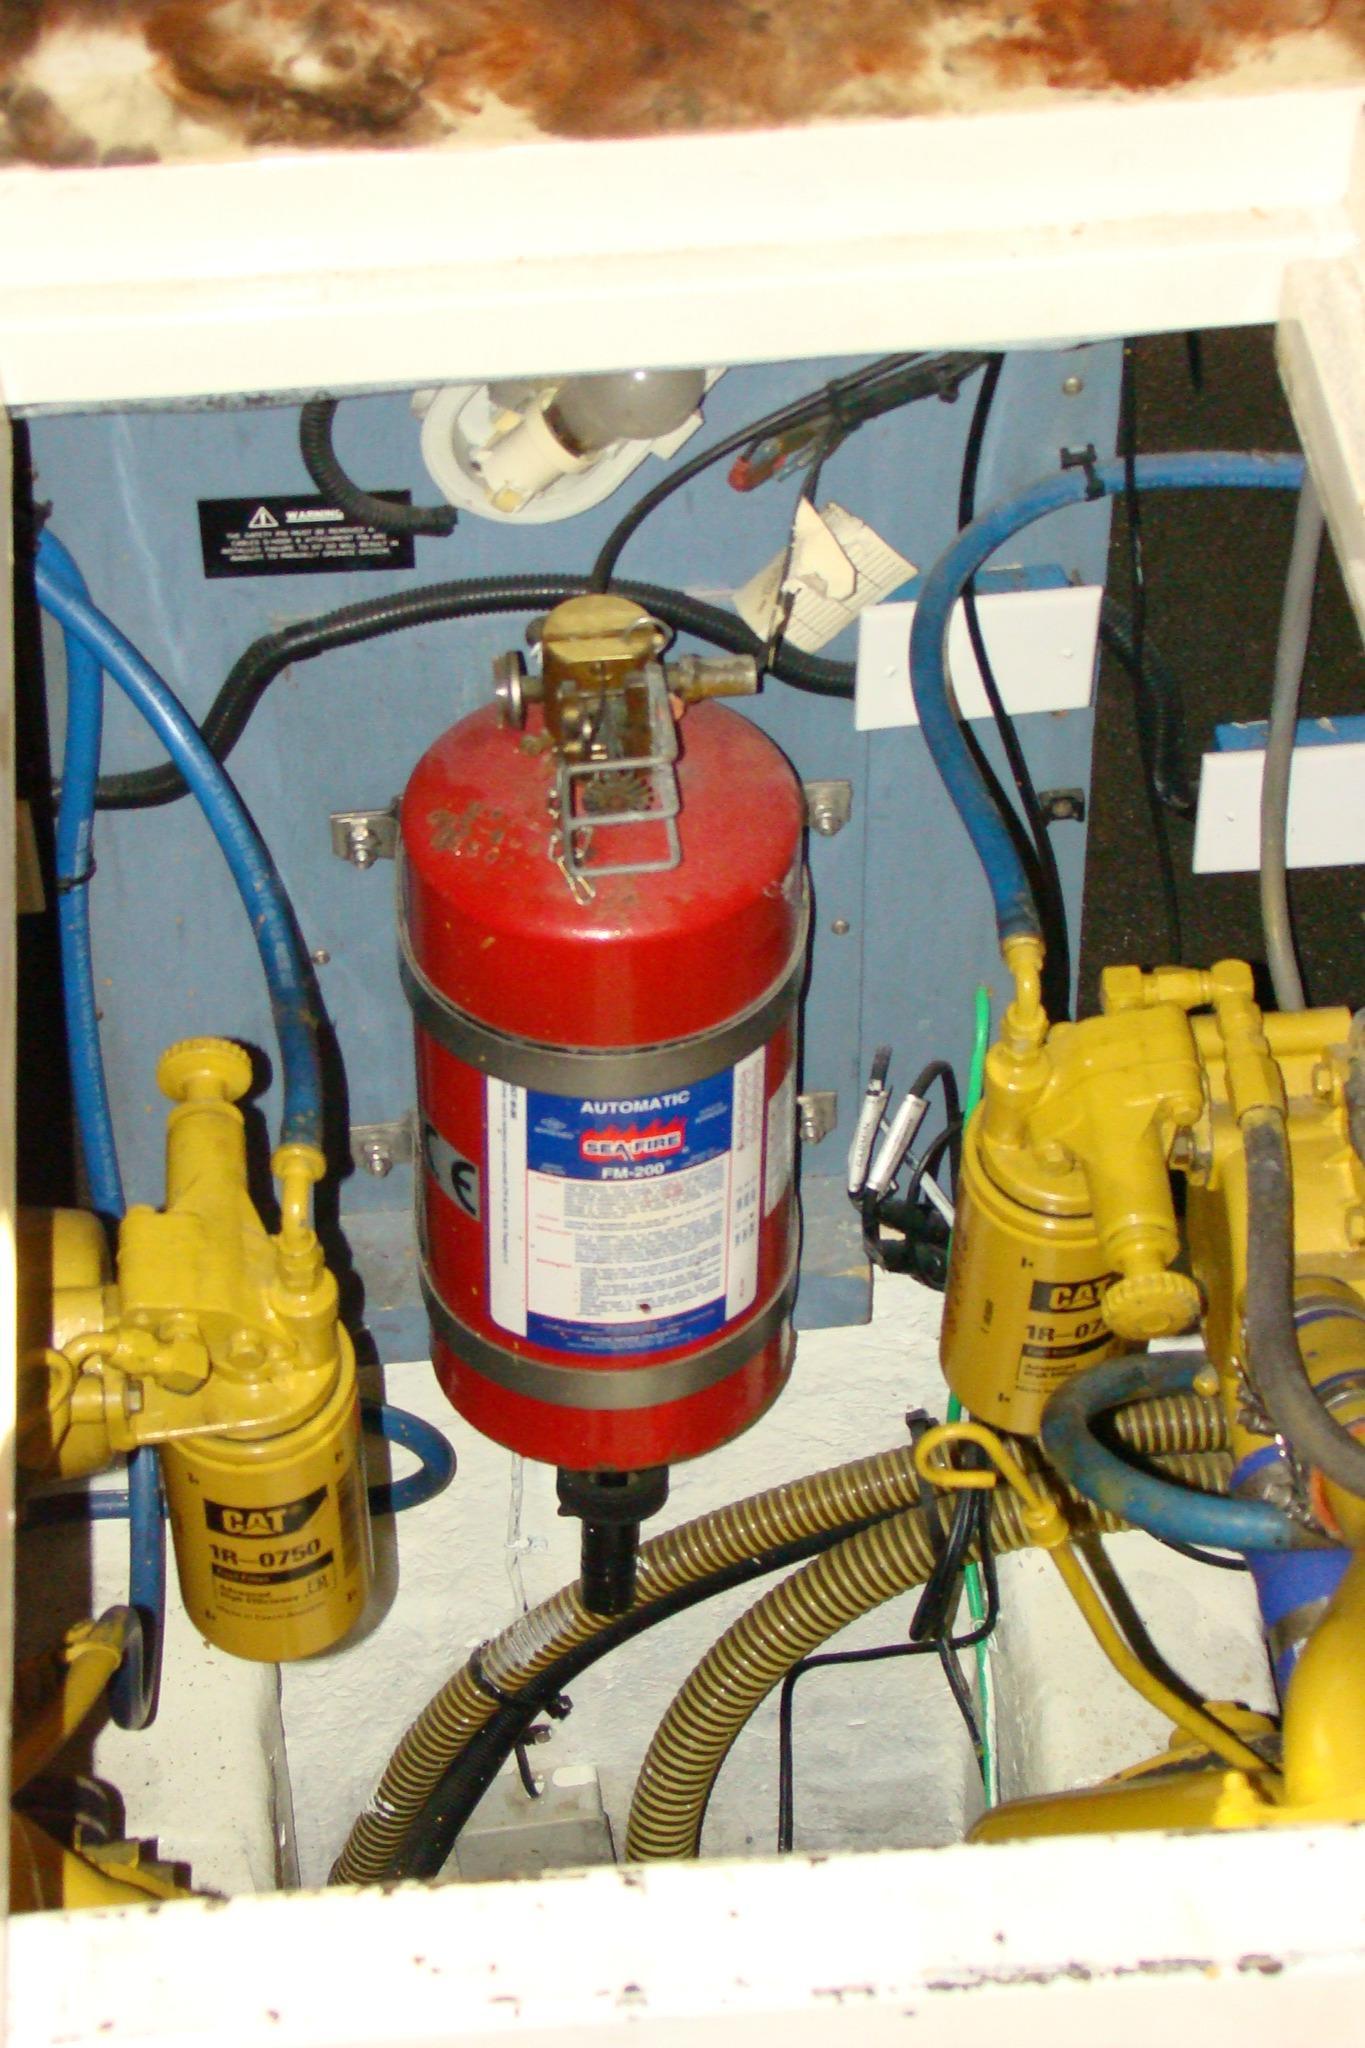 Viking Princess V50 - Automatic Fire Extinguisher